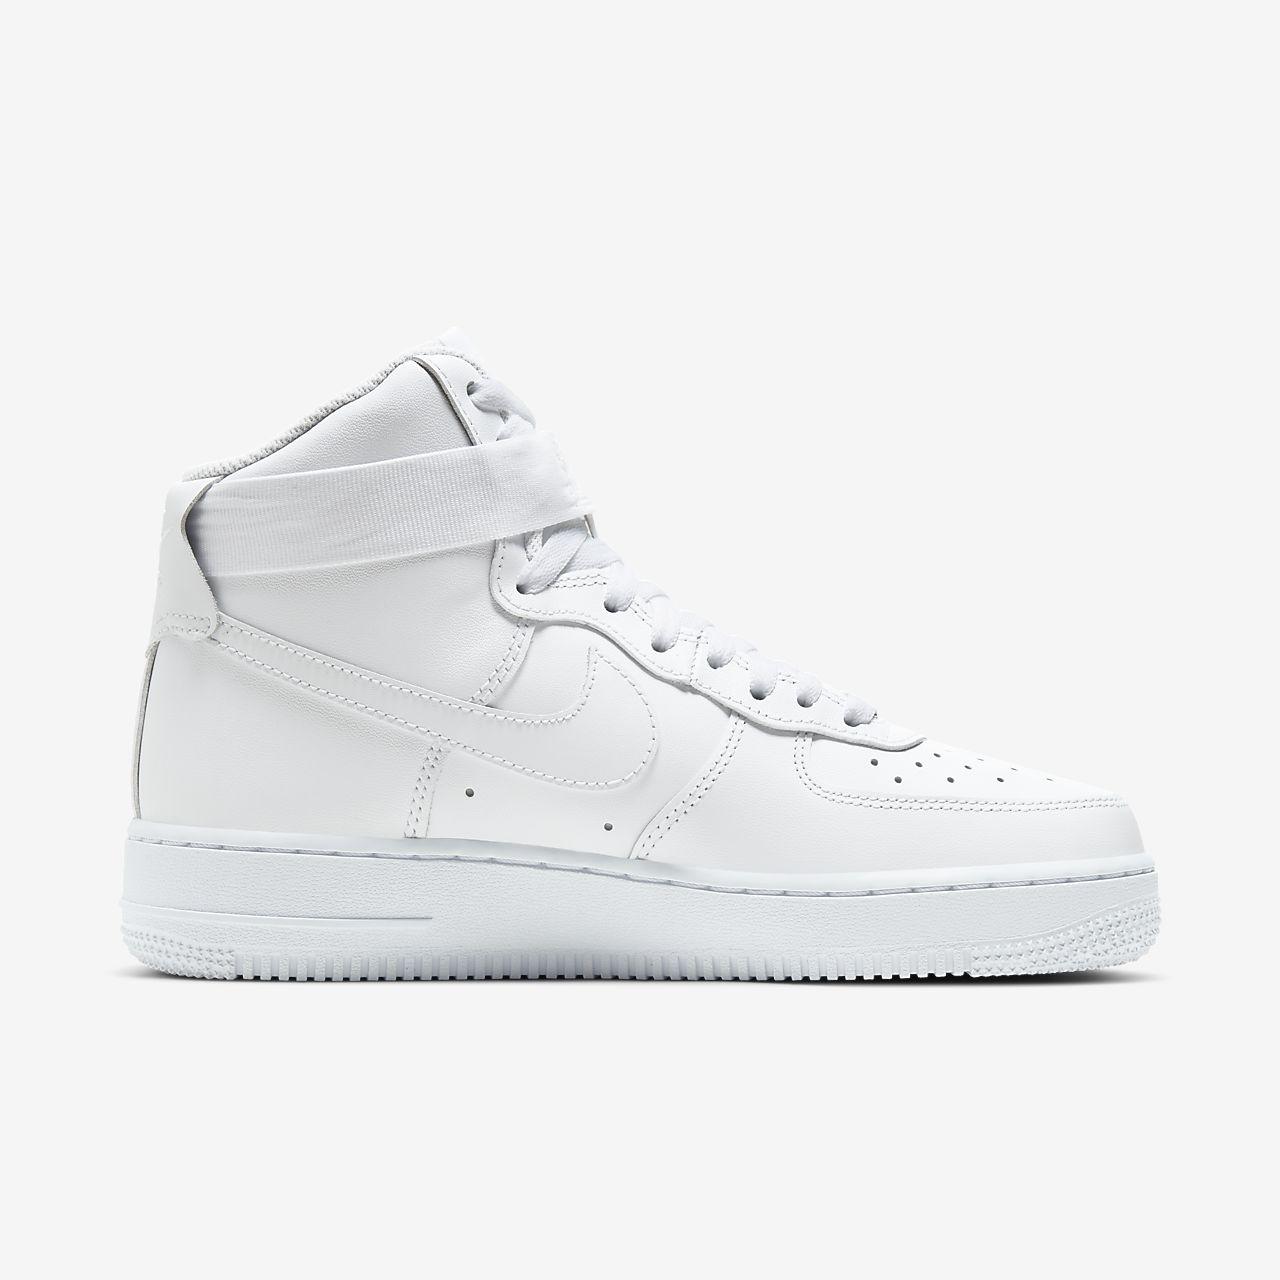 6d627a94baee6b Nike Air Force 1 High 08 LE Women s Shoe. Nike.com NZ